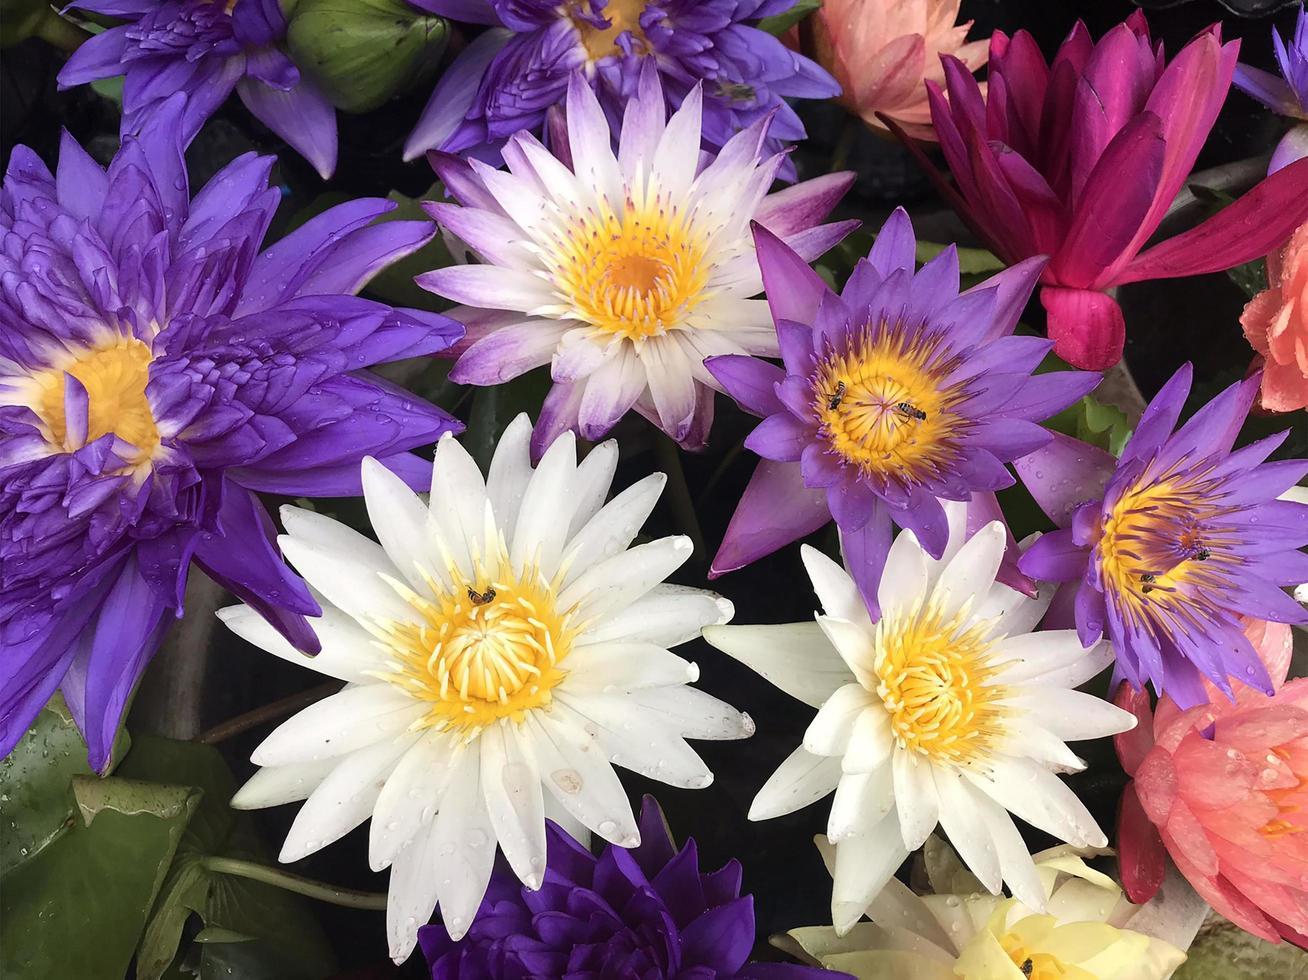 gruppo di fiori di loto foto